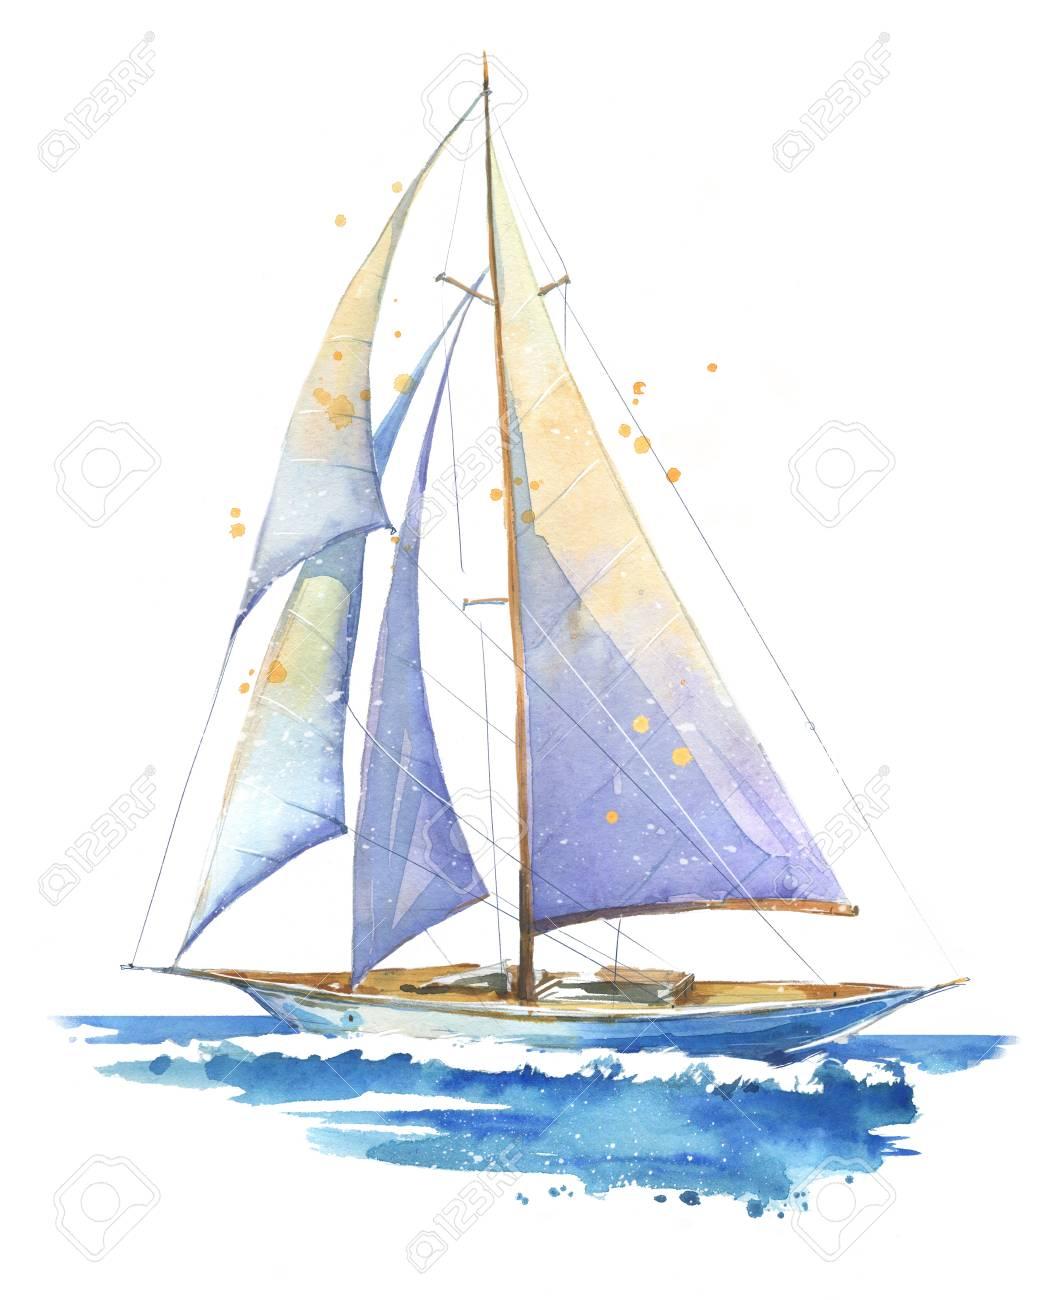 Sailing boat, watercolor painted illustration - 120630464